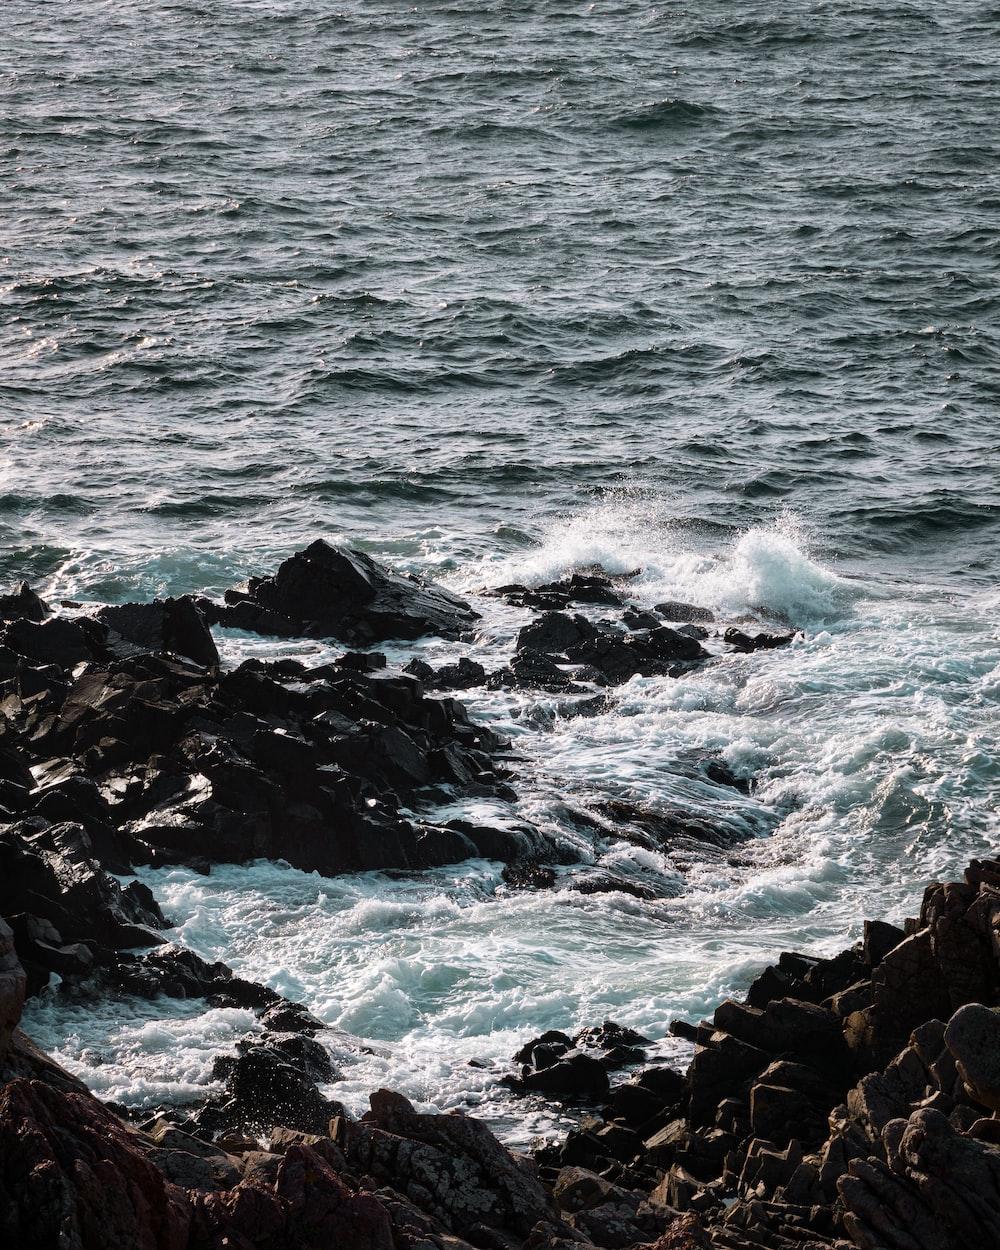 black rocky shore with ocean waves crashing on rocks during daytime